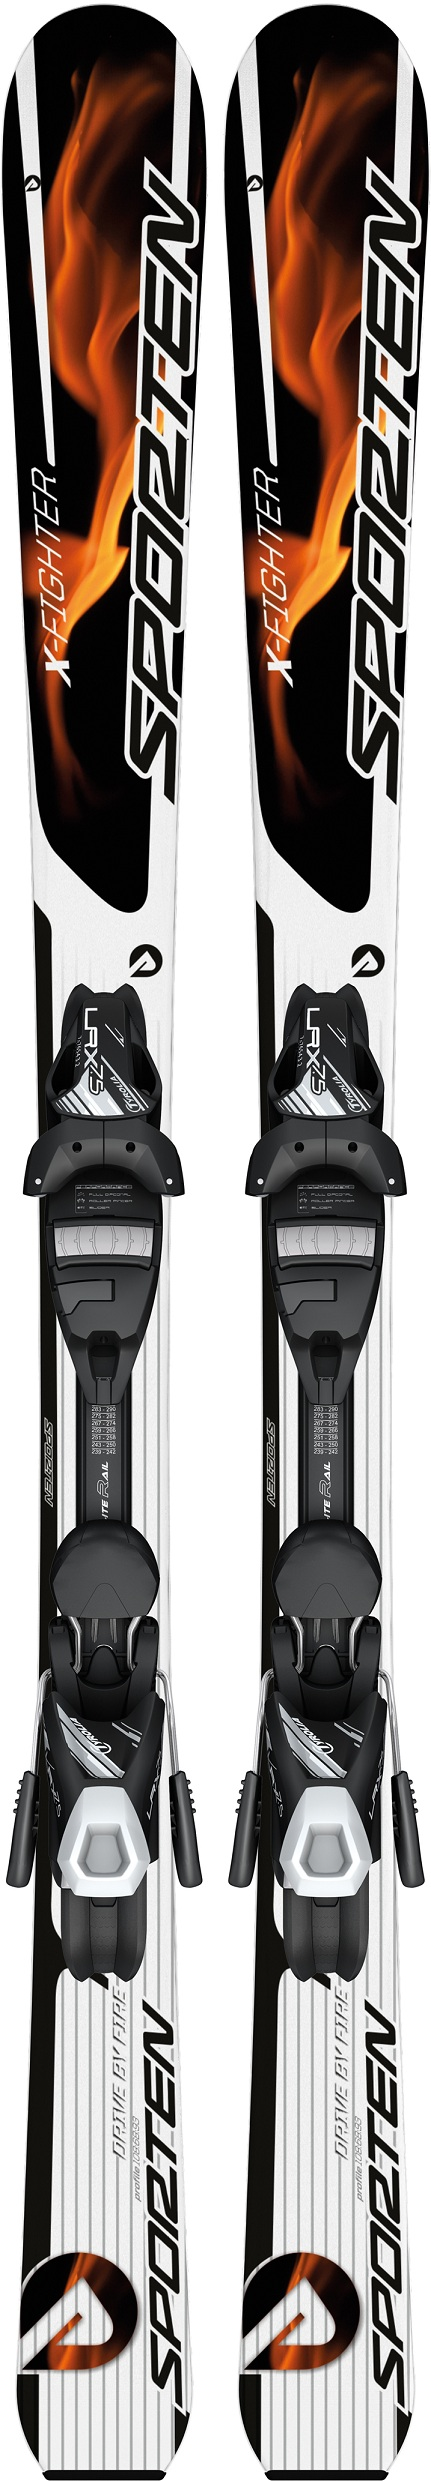 Sporten set sjezdové lyže X-Fighter JR 13/14 + Tyrolia LRX 7.5 AC a deska Barva, typ:: Sporten X-Fighter JR, Délka (cm):: 130